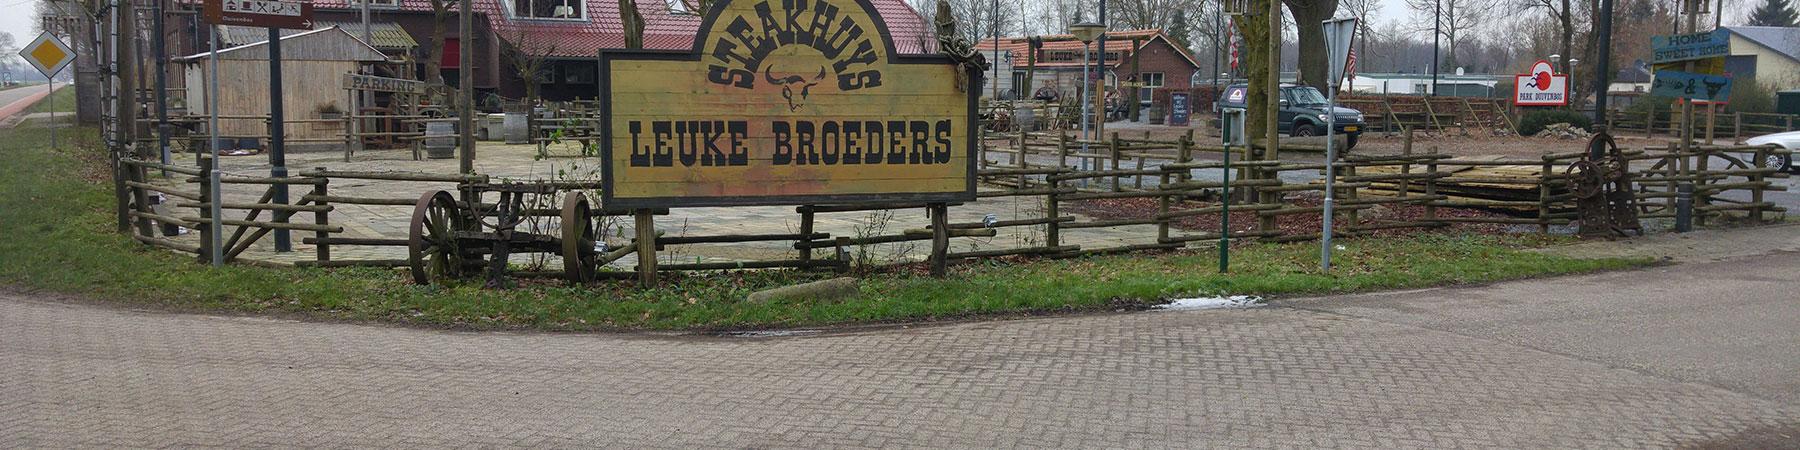 leuke-broeders-overloon4